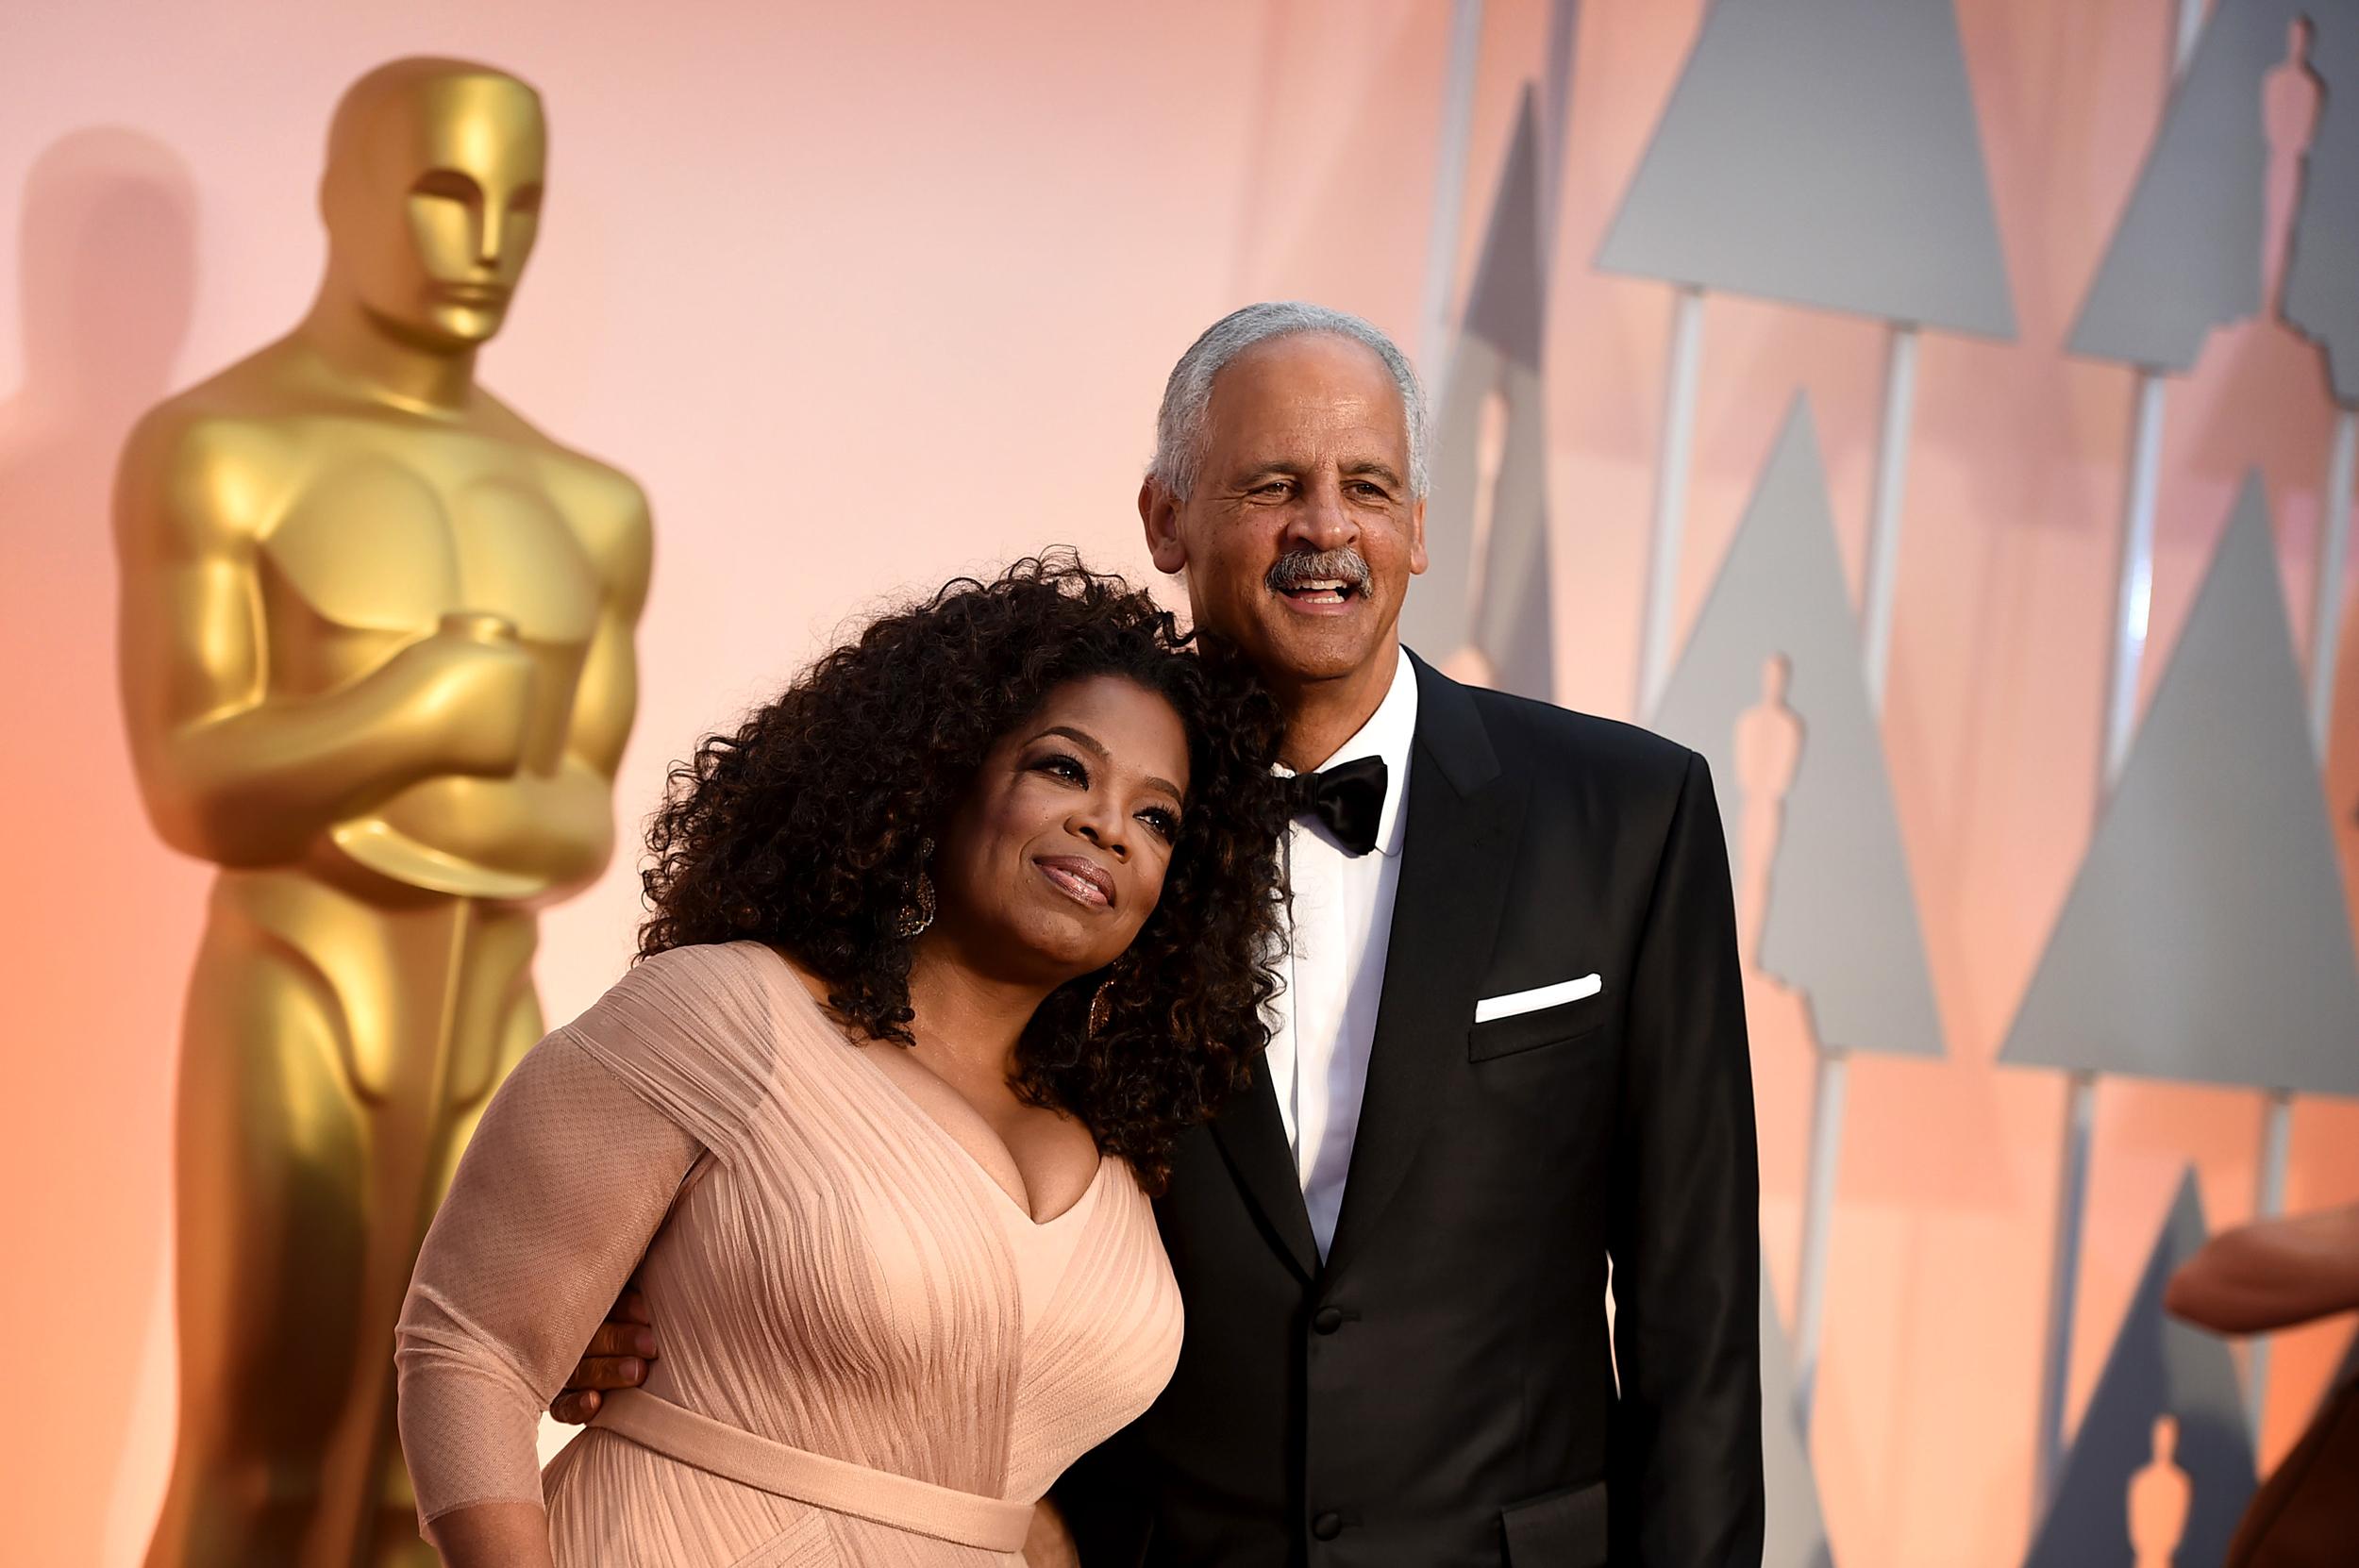 Oprah explains why she and Stedman Graham chose 'spiritual partnership' over marriage